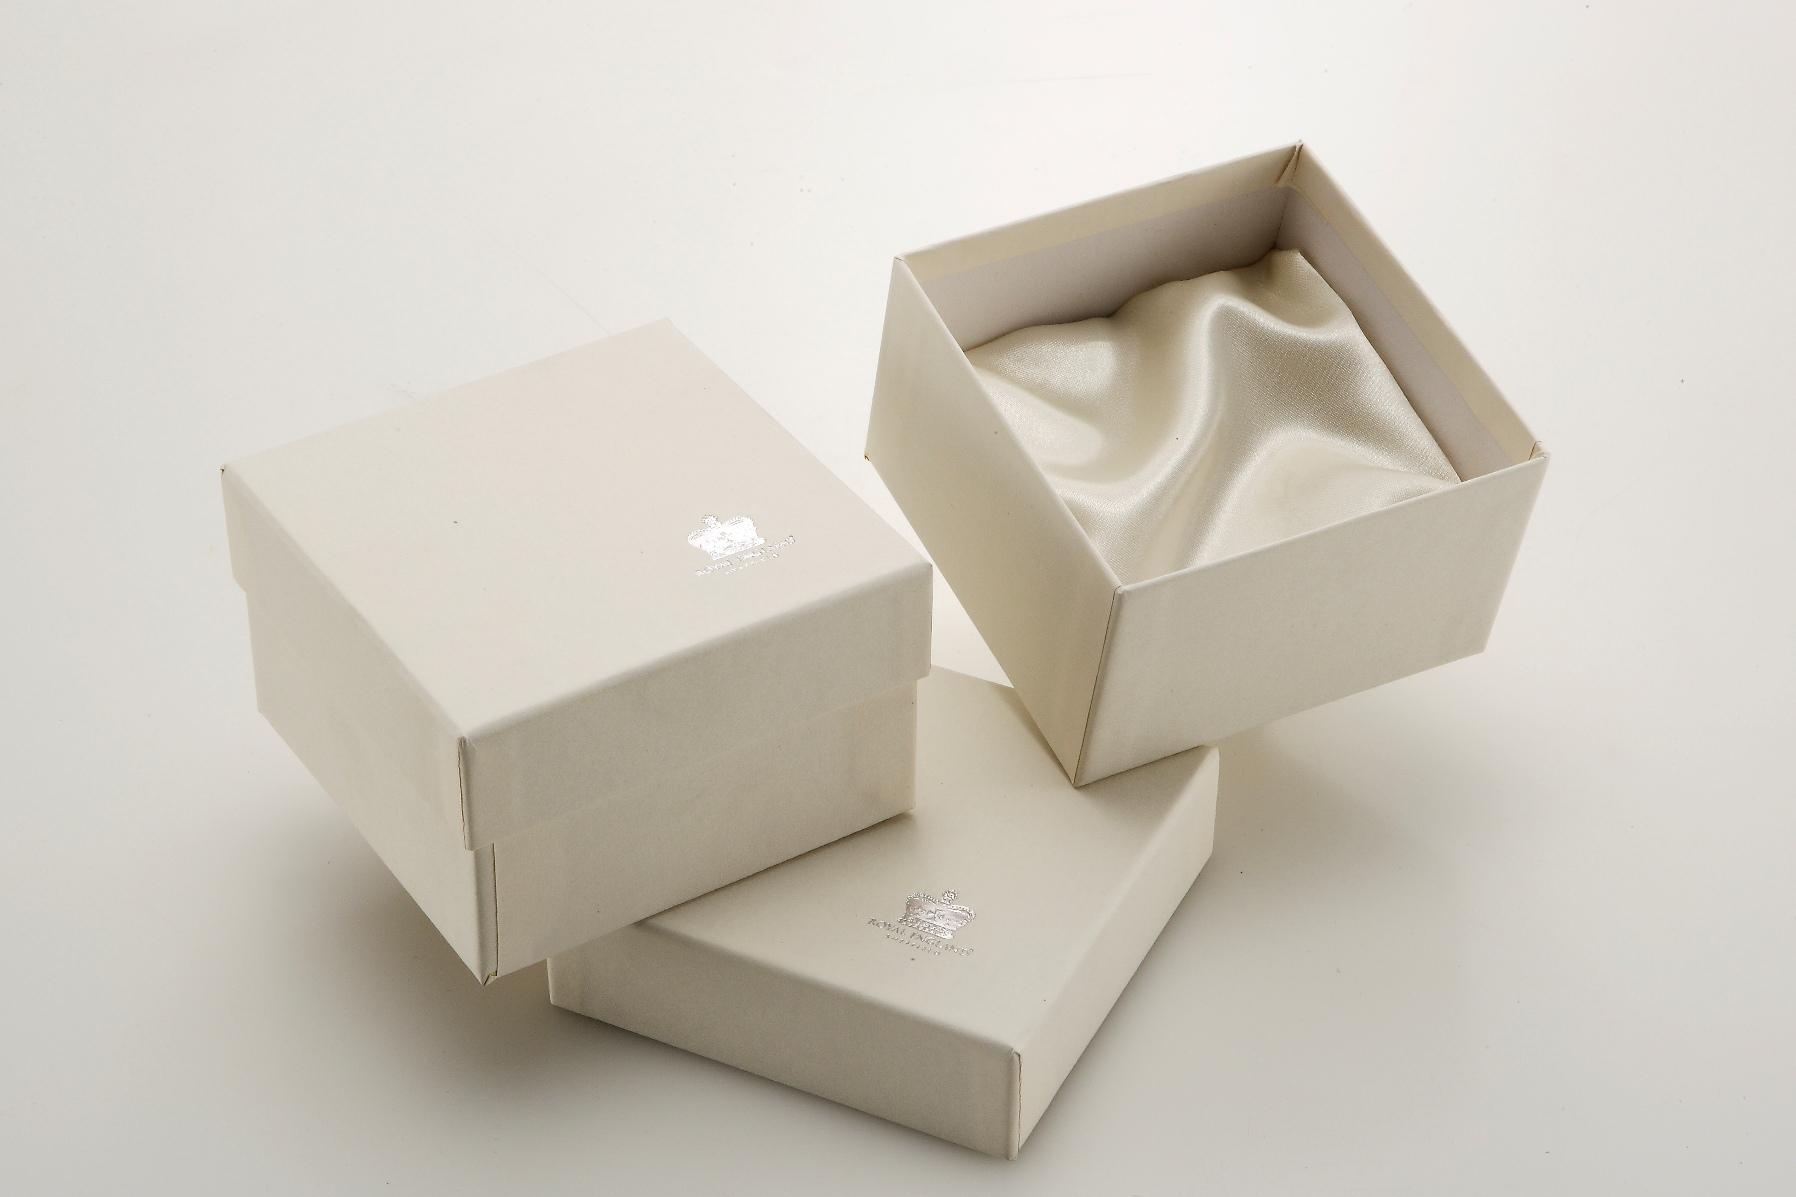 Scatola havana con raso cm.7,5x7,5x9h